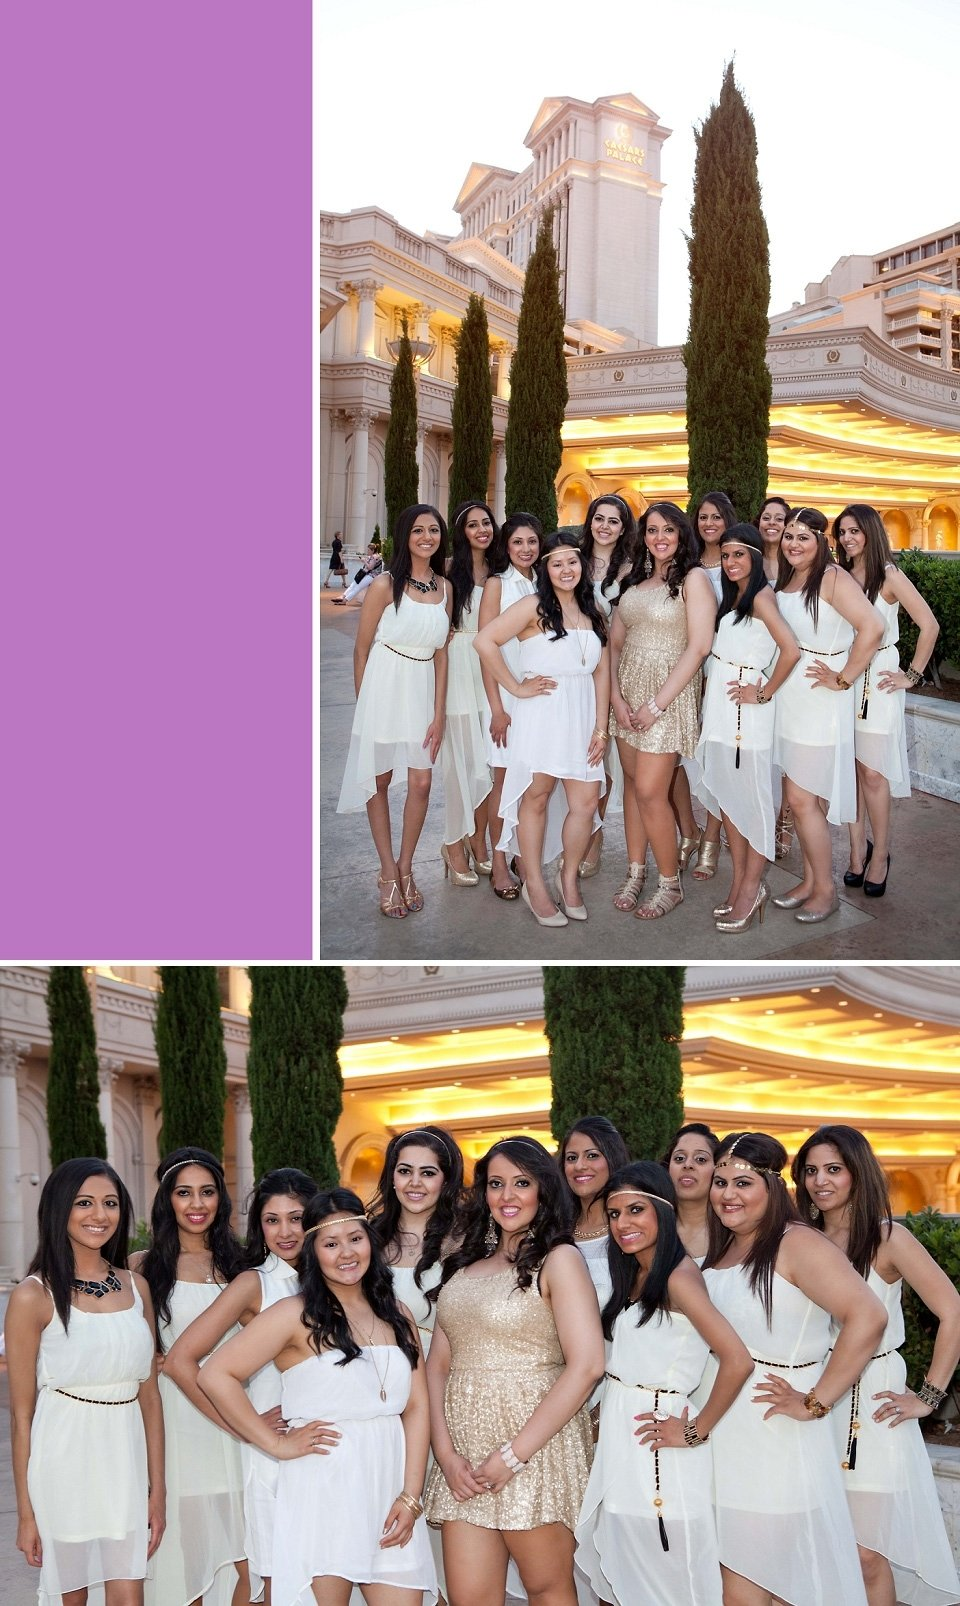 10 Stunning Bachelor Party Ideas Las Vegas bachelorette party ideas greek goddess themed bachelorette party 2020